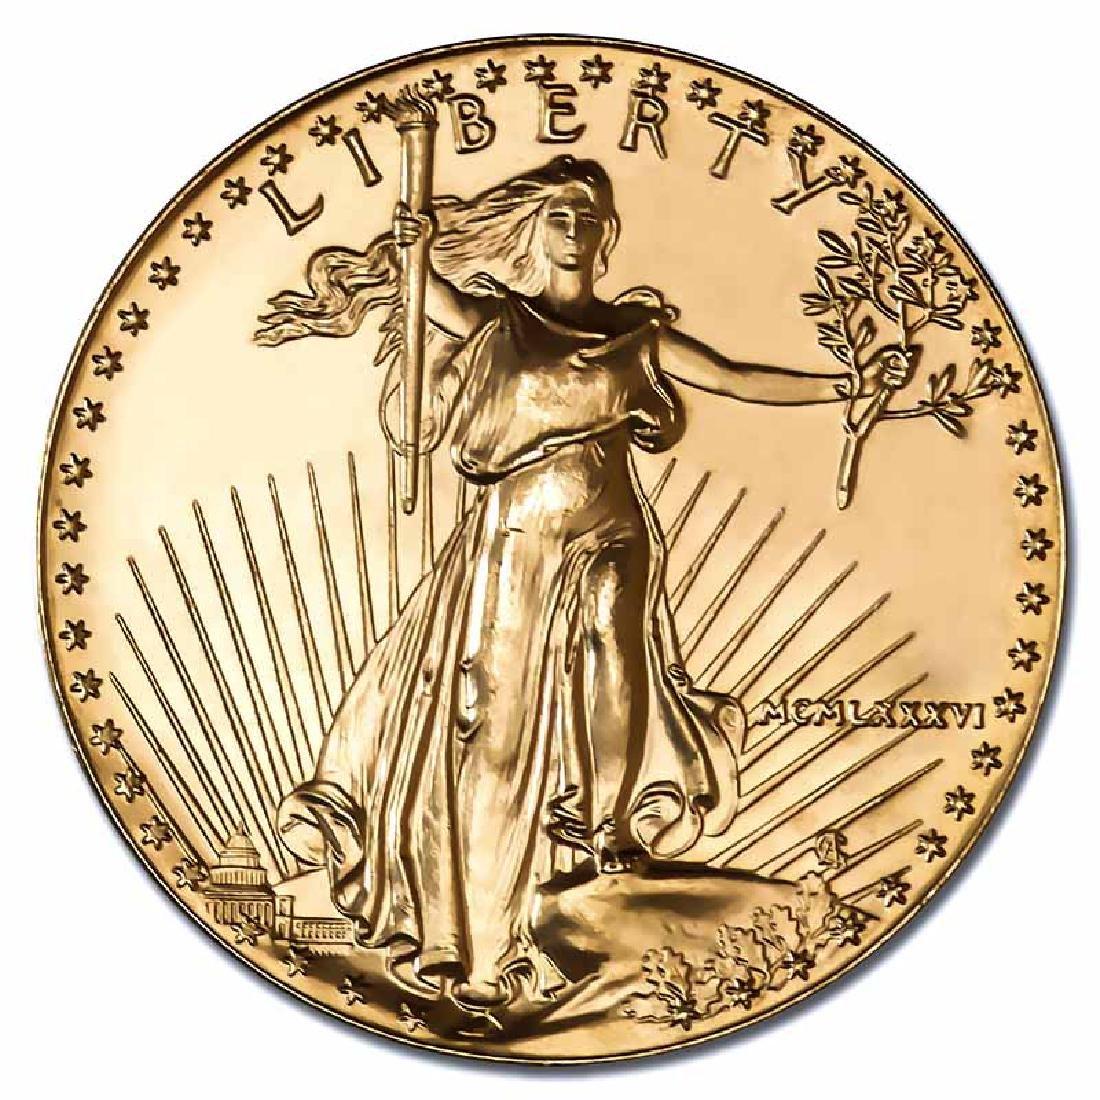 1986 American Gold Eagle 1 oz Uncirculated